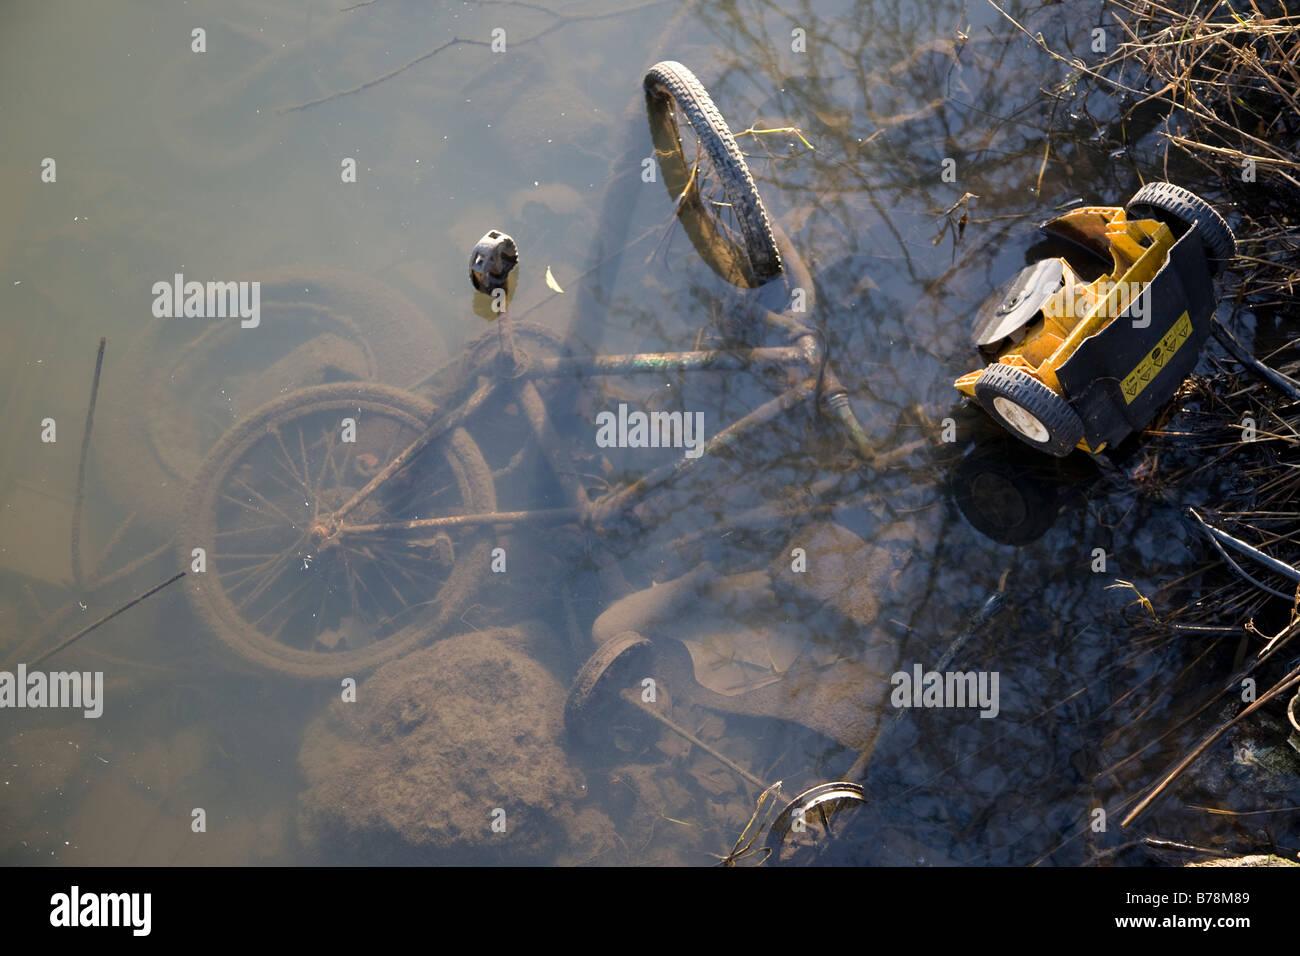 Old bike dumped in river - Stock Image